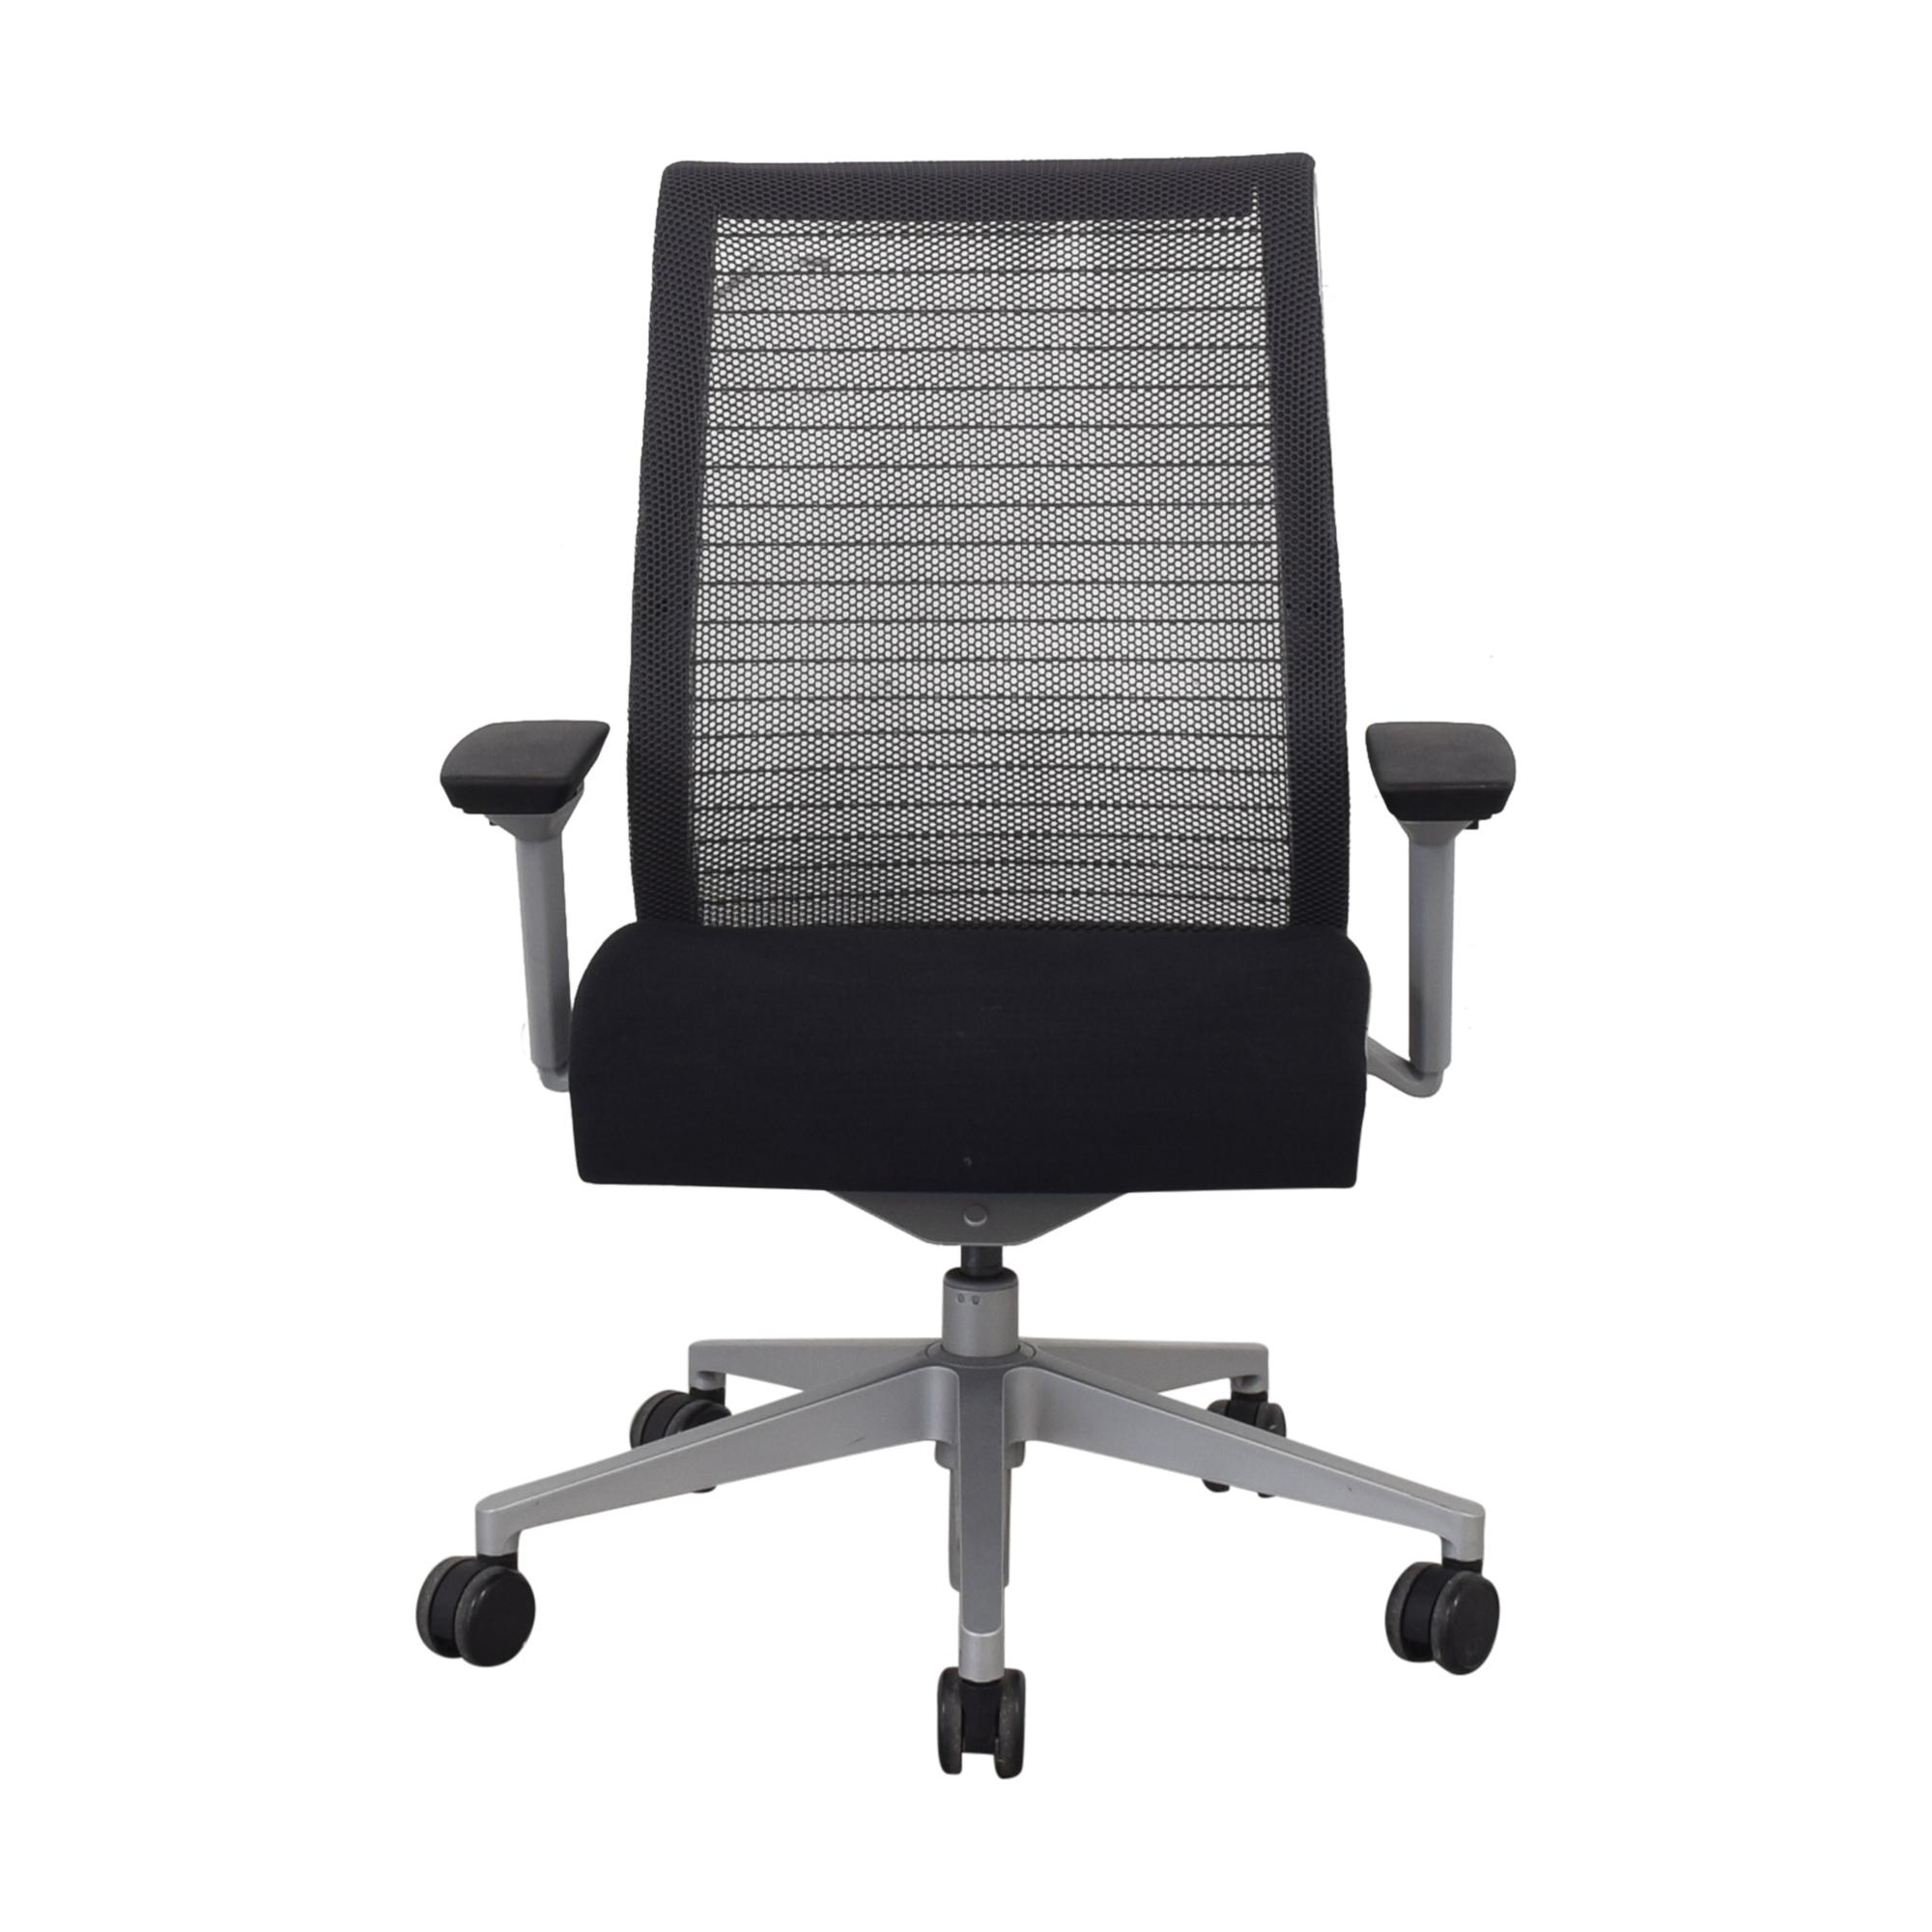 Steelcase Cobi Swivel Chair Steelcase